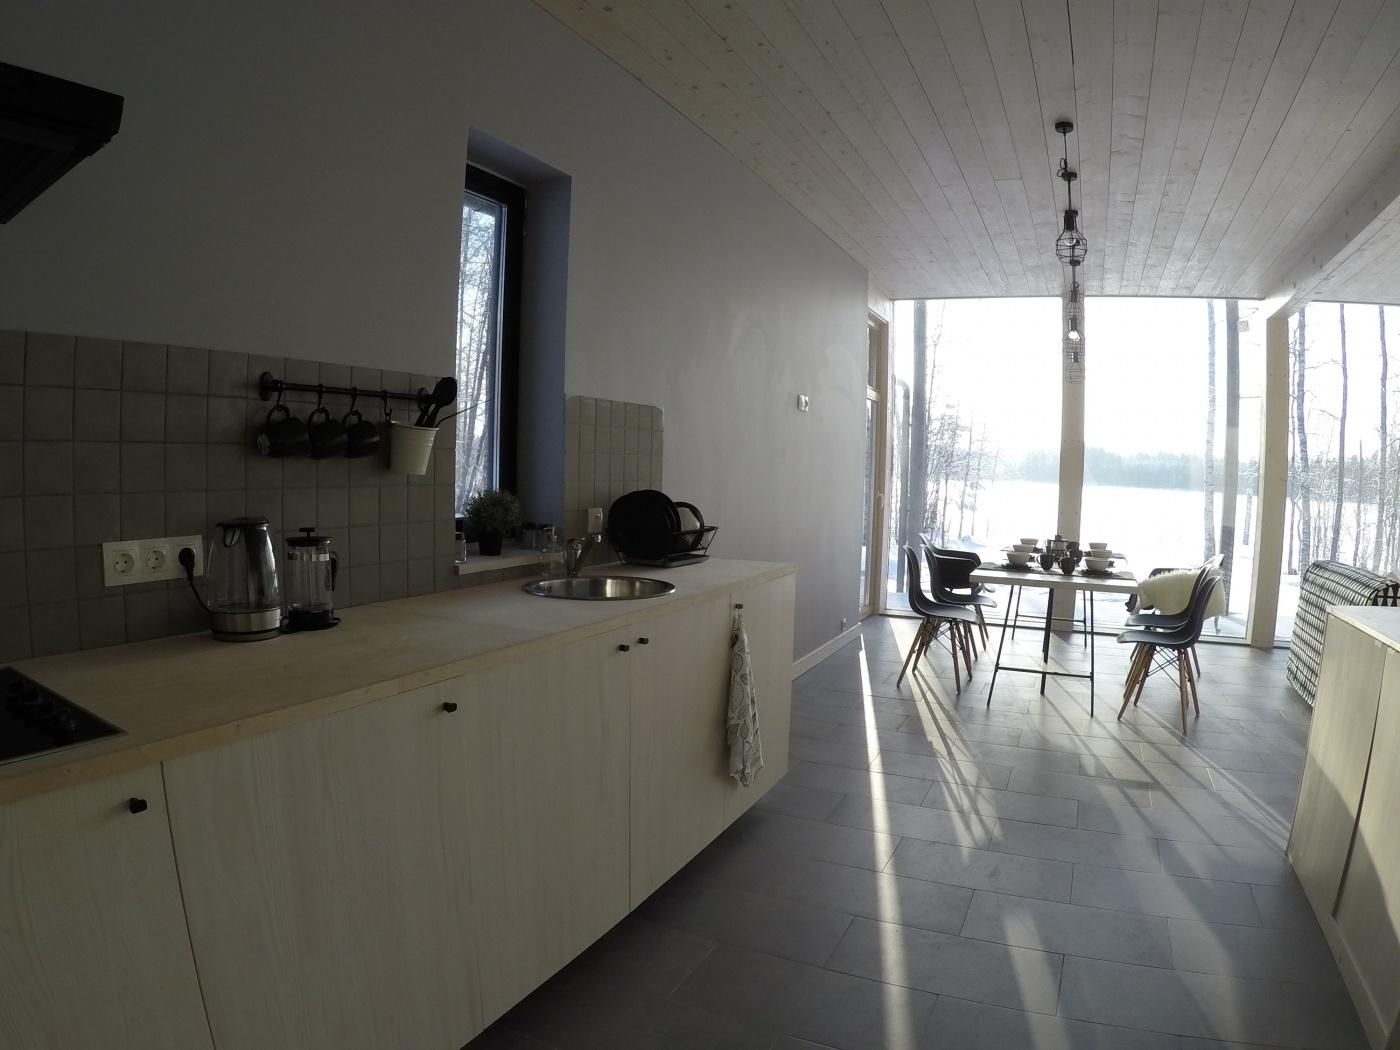 Коттеджный комплекс «Ахвенлампи» Республика Карелия Лофт-хаус «Матриярви», фото 12